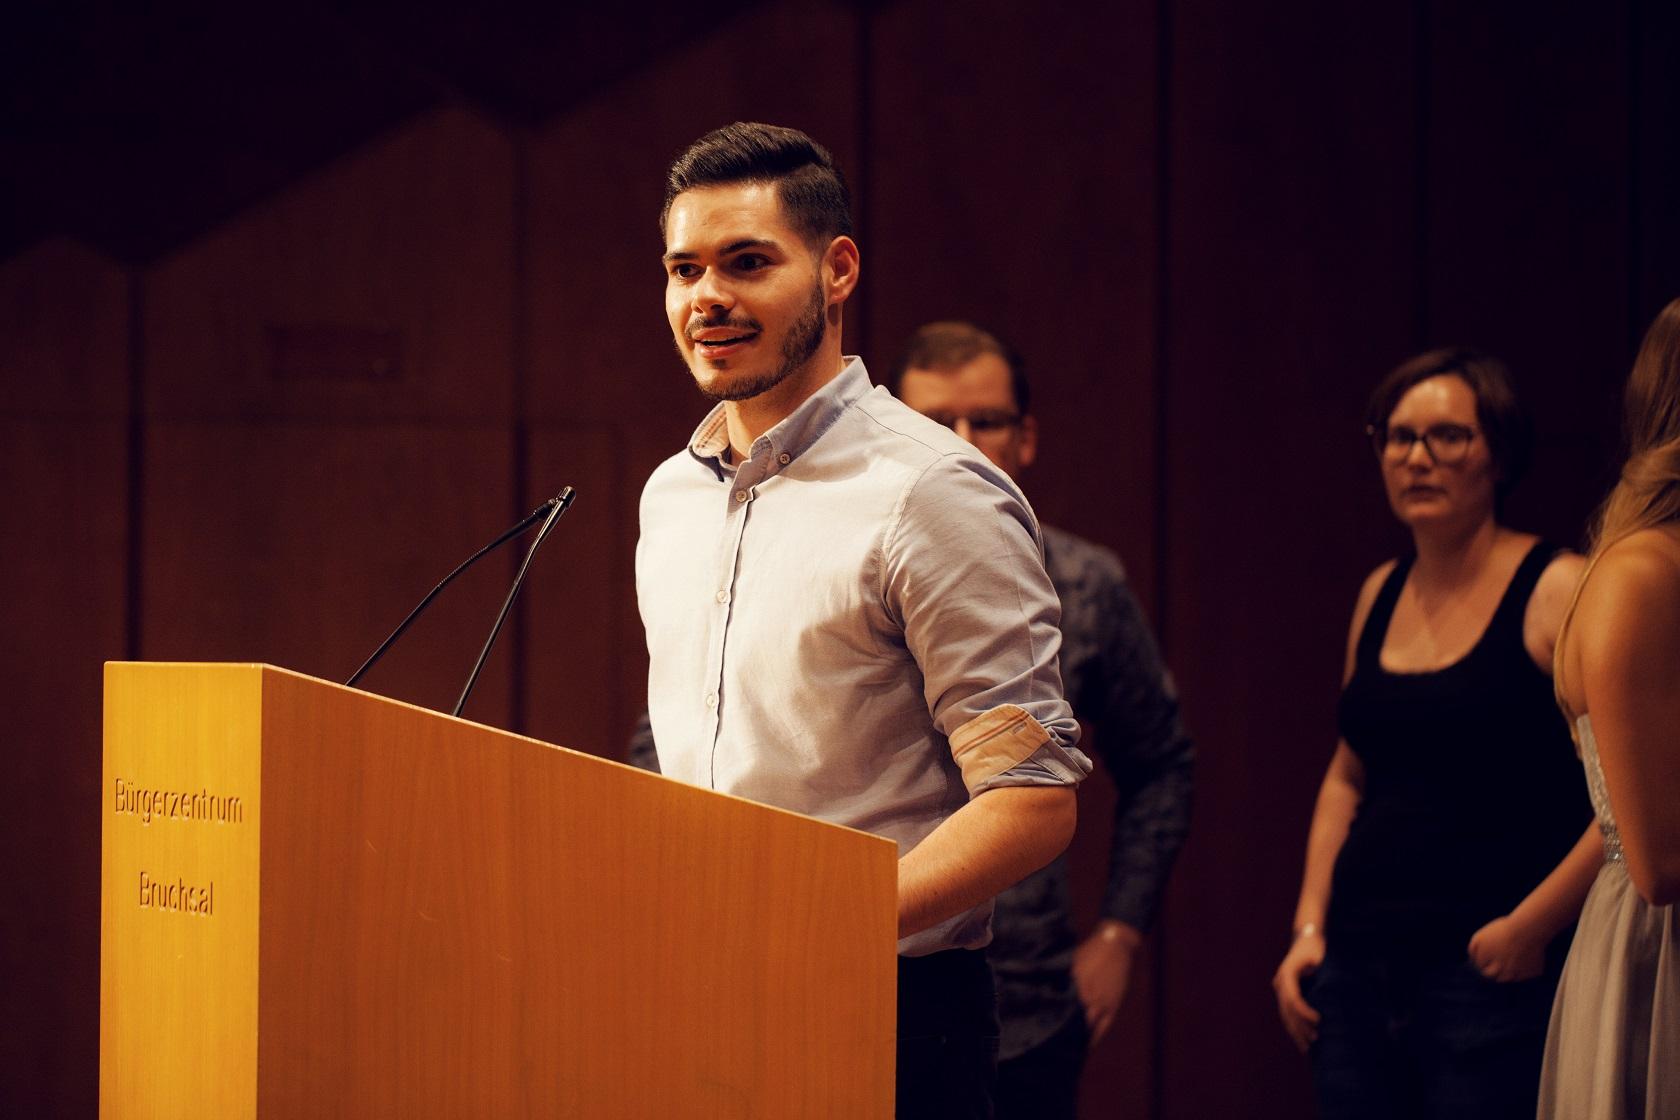 Freisprechungsfeier Bruchsal 2017 Junggesellen verabschieden Lehrer